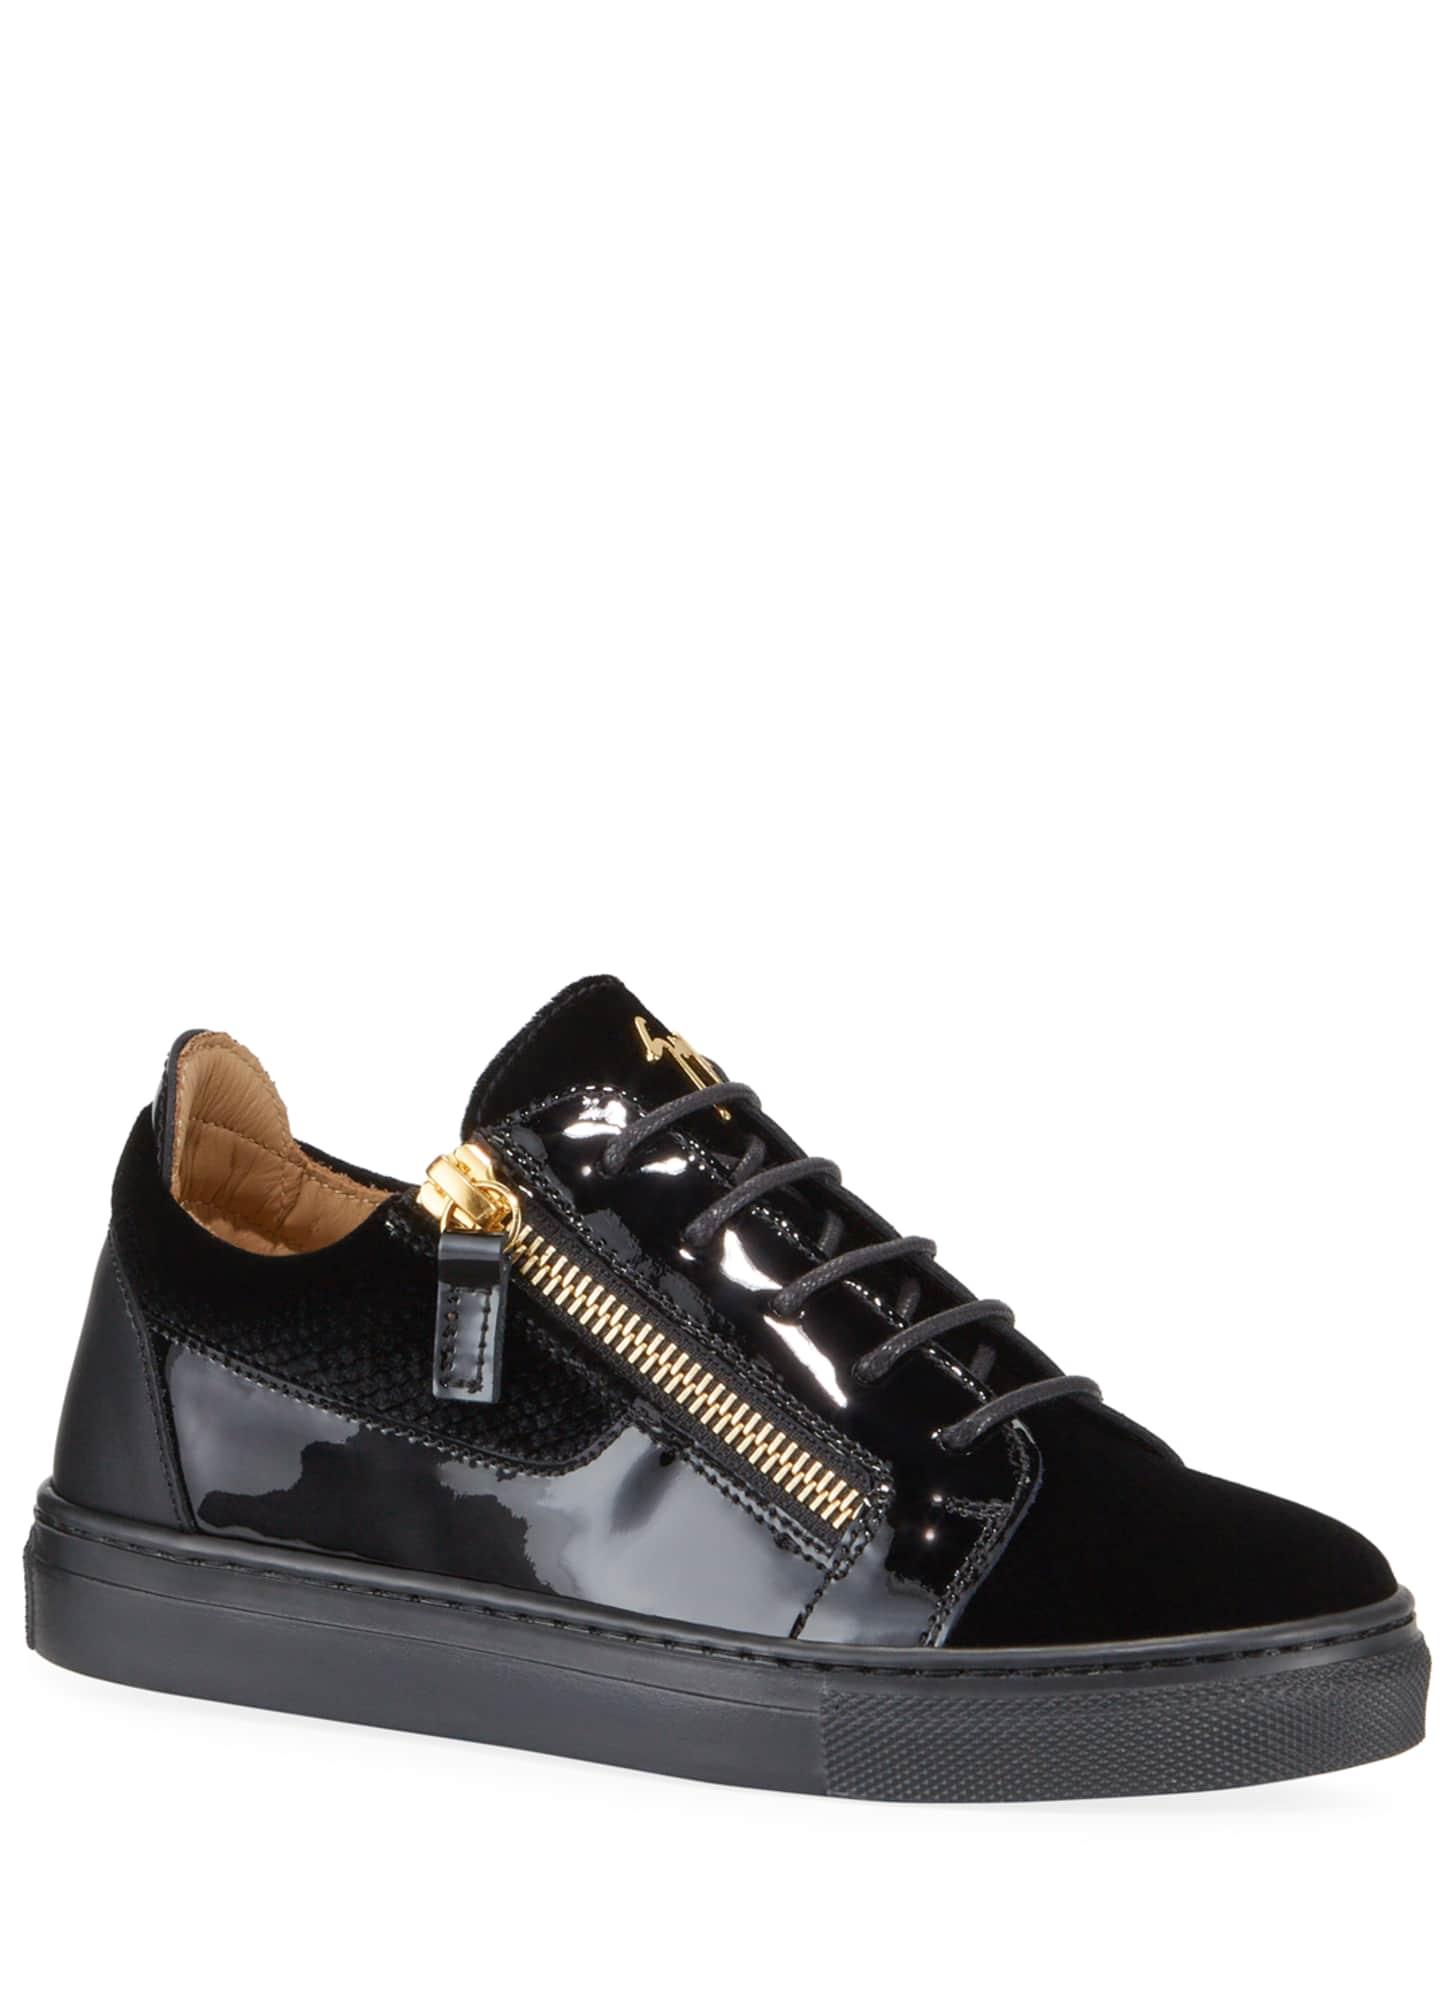 Giuseppe Zanotti London Patent Leather & Velvet Low-Top